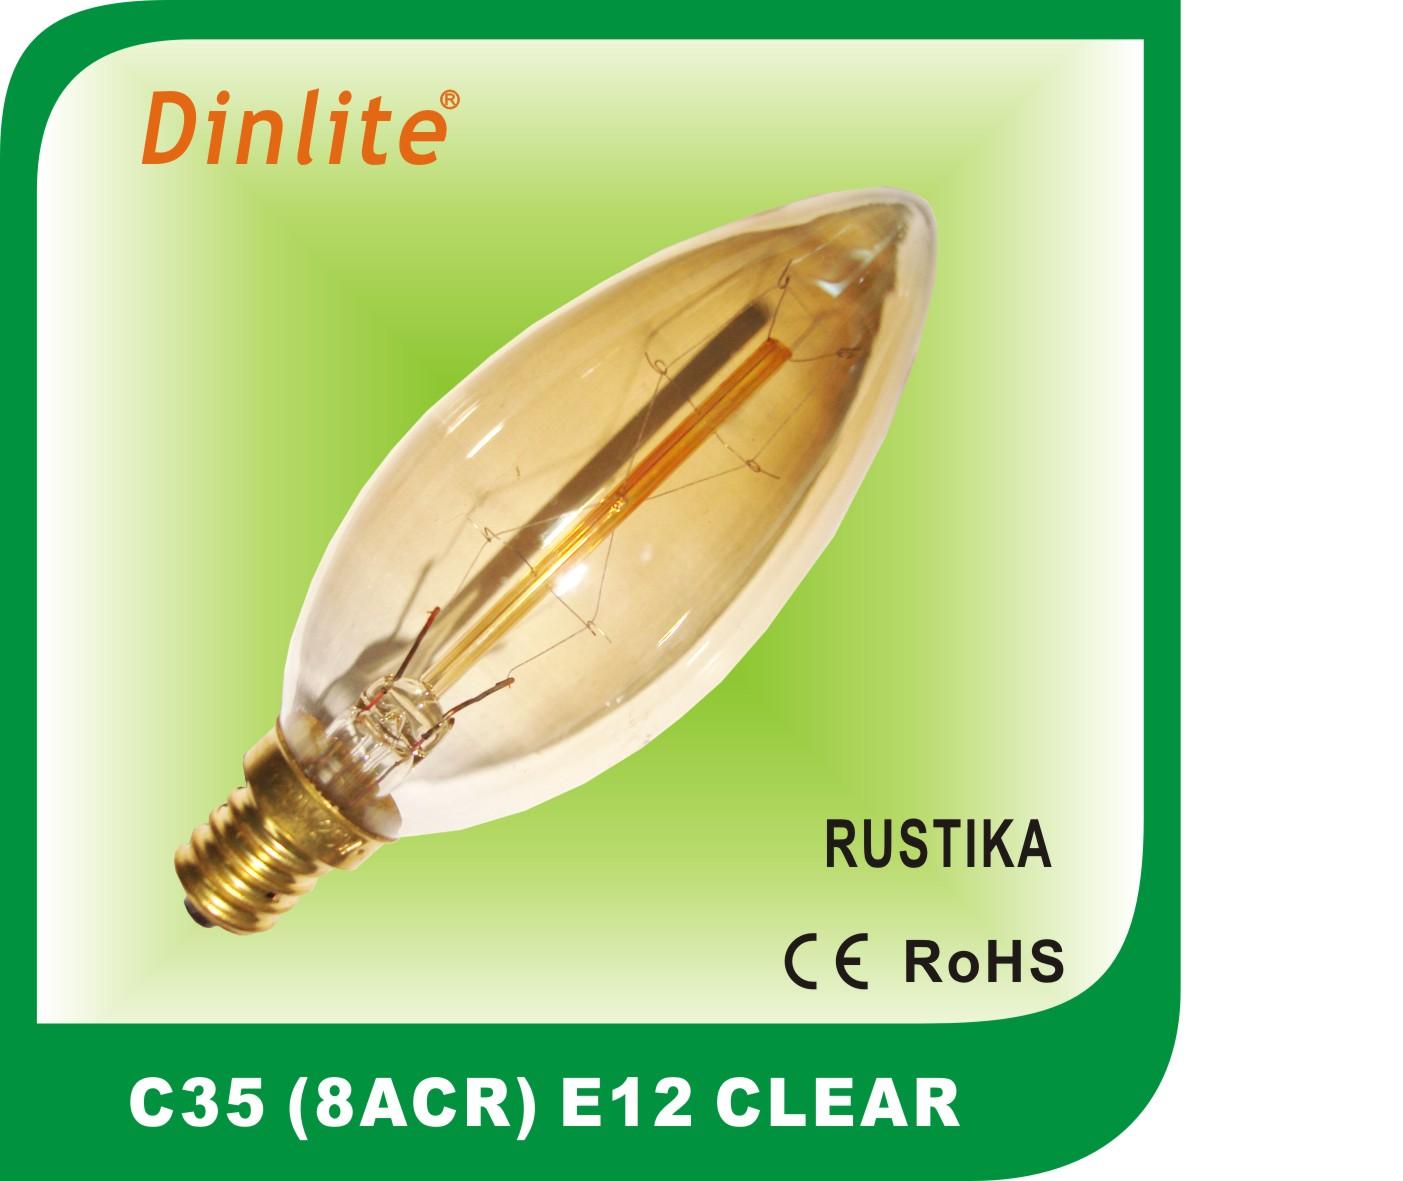 C35 Vintage Bulb Rustica Lamp Decorative Lightings Manufacturers